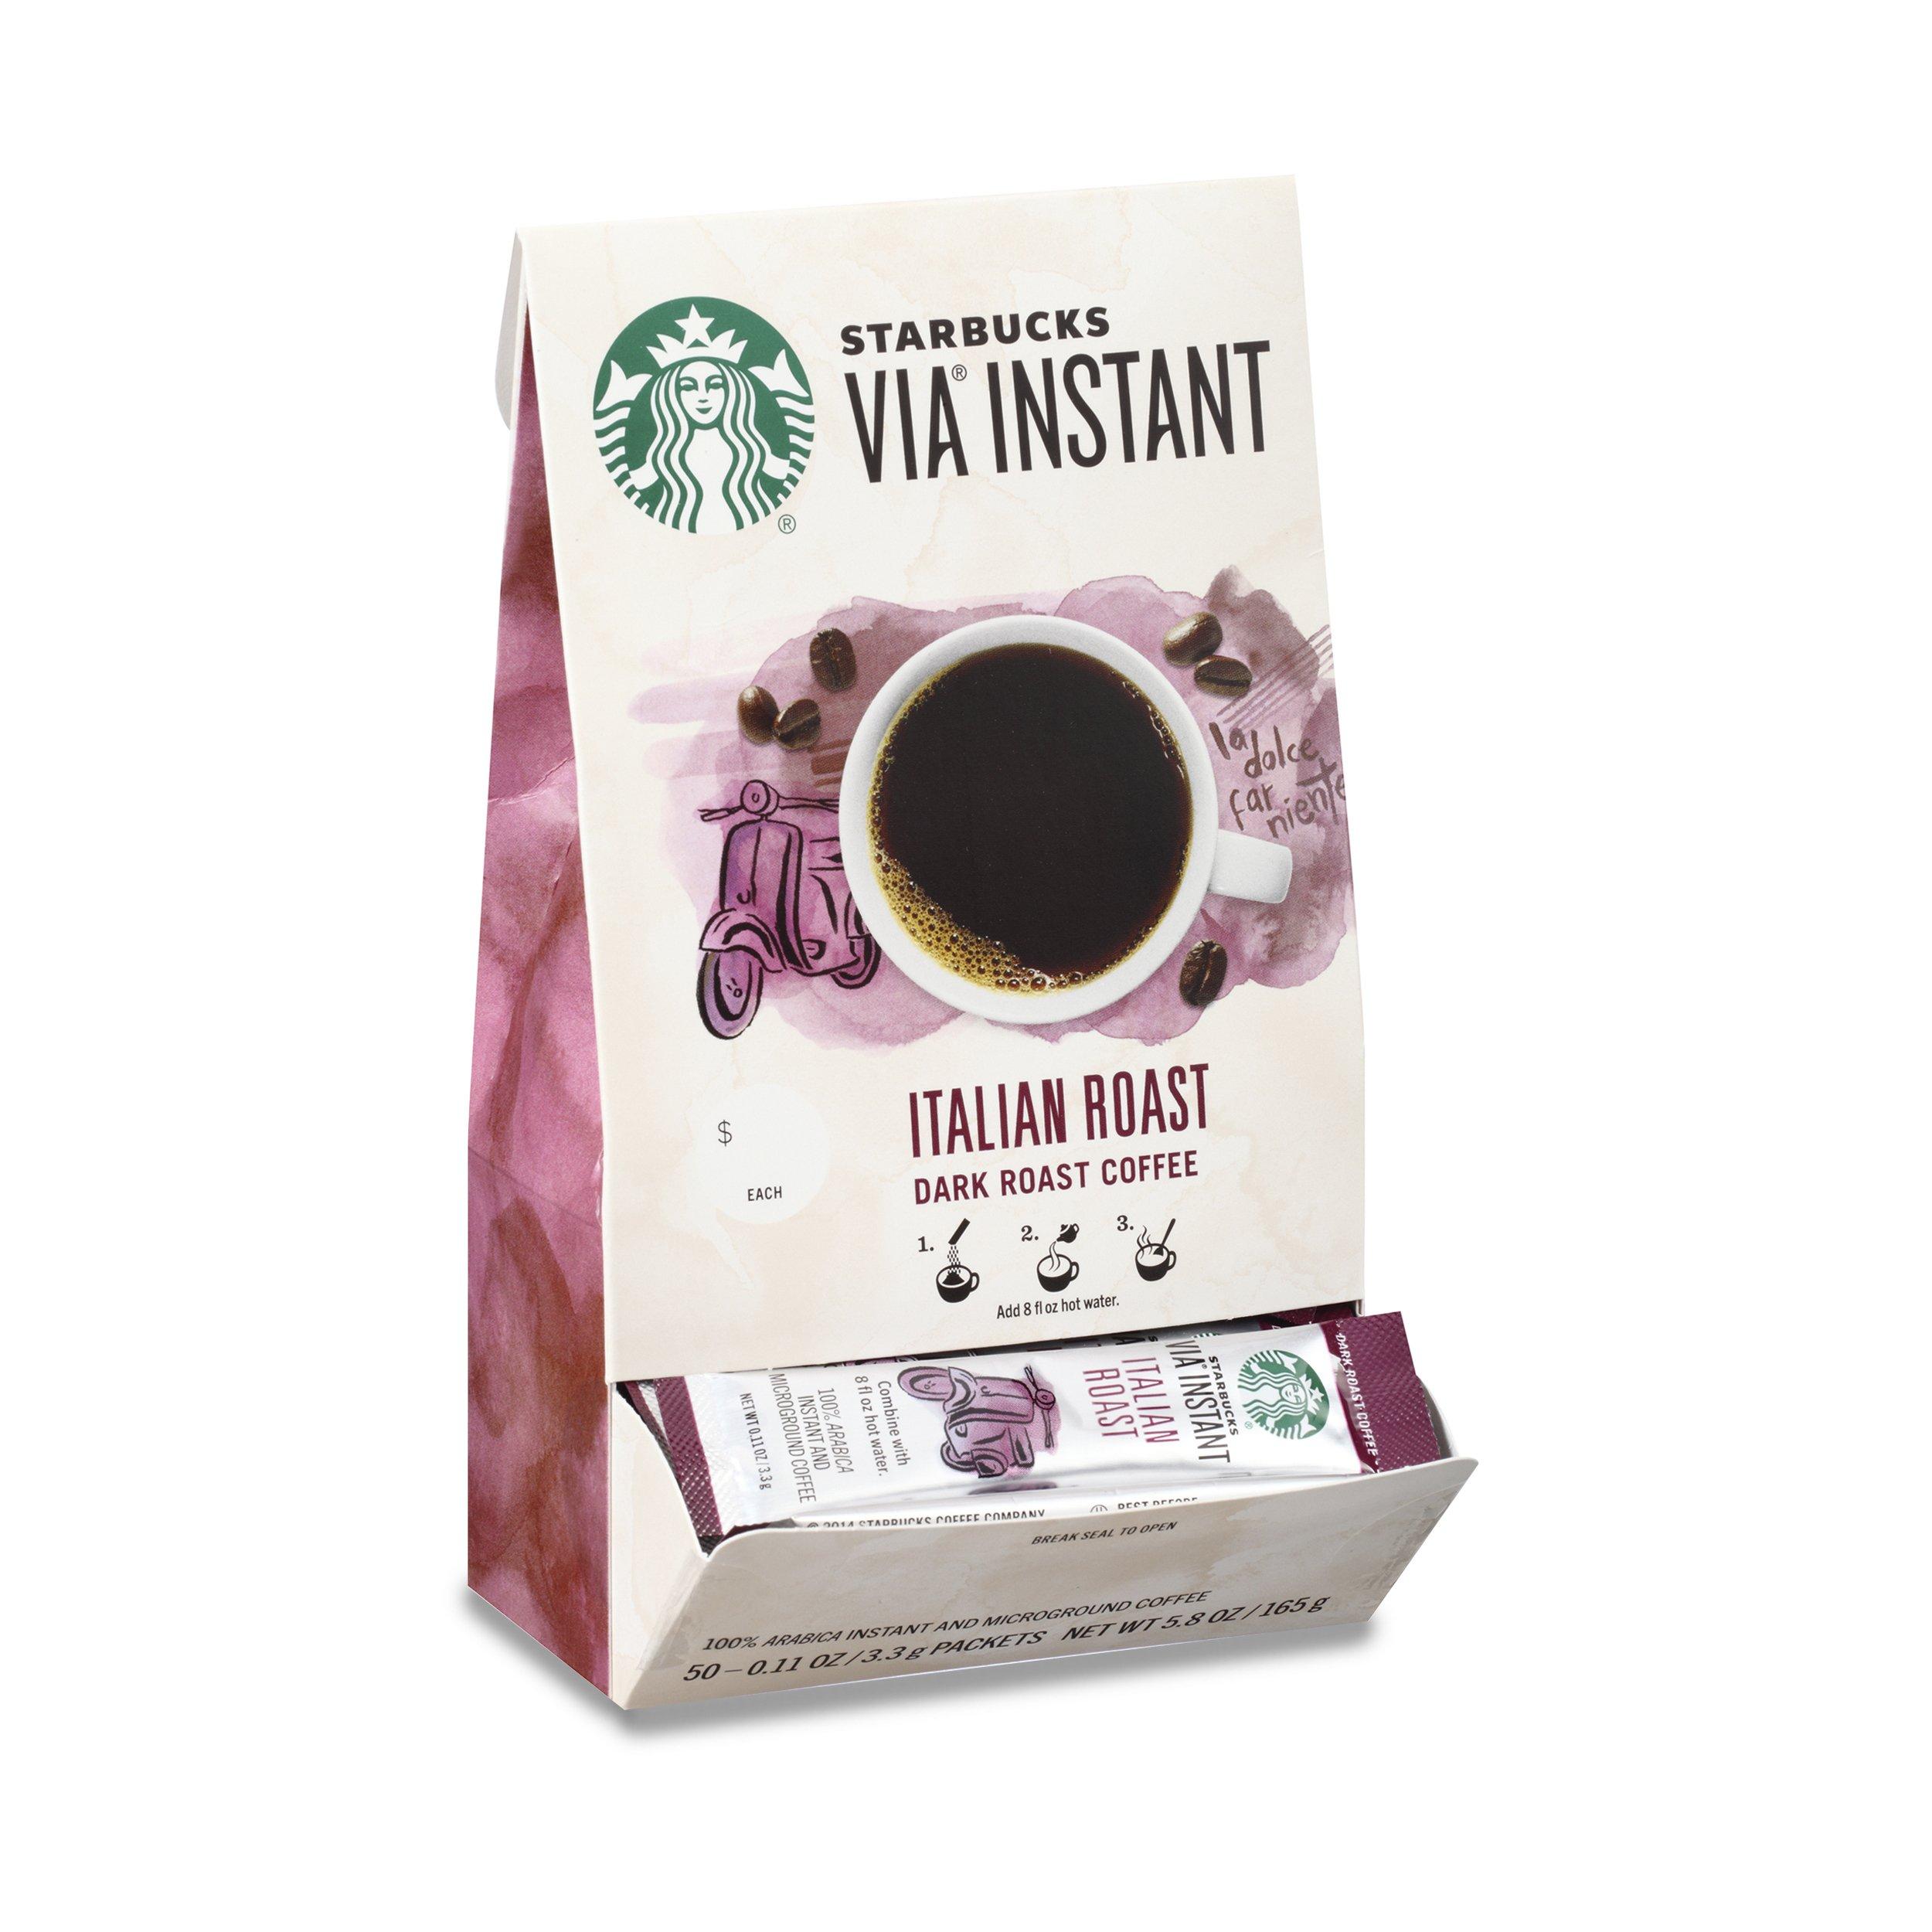 Starbucks VIA Instant Italian Roast Dark Roast Coffee (1 box of 50 packets)